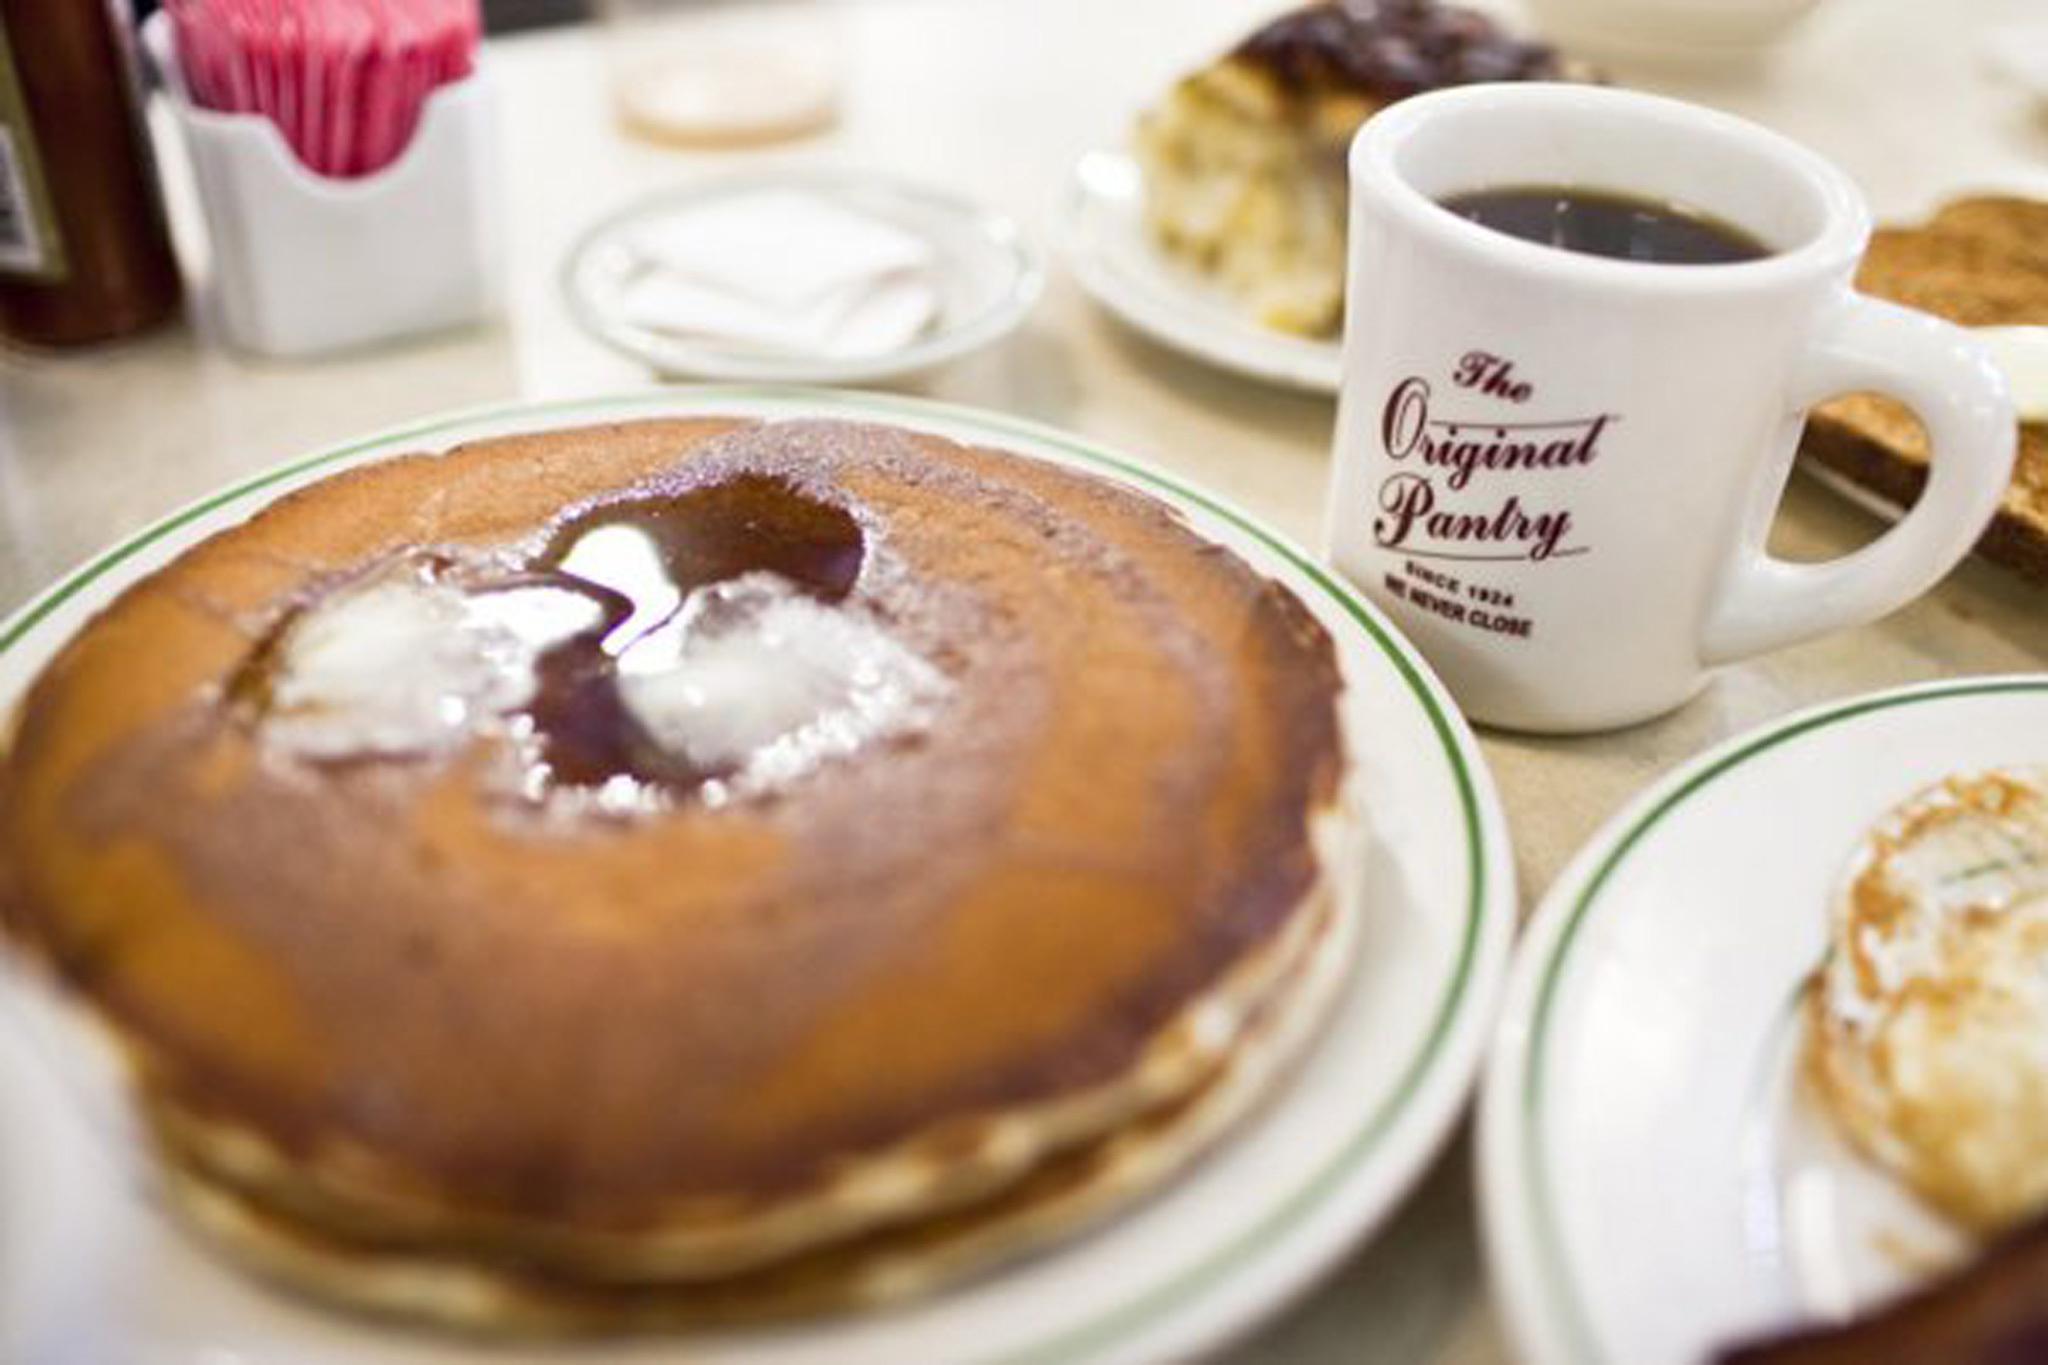 original pantry cafe, diner, pancakes, breakfast